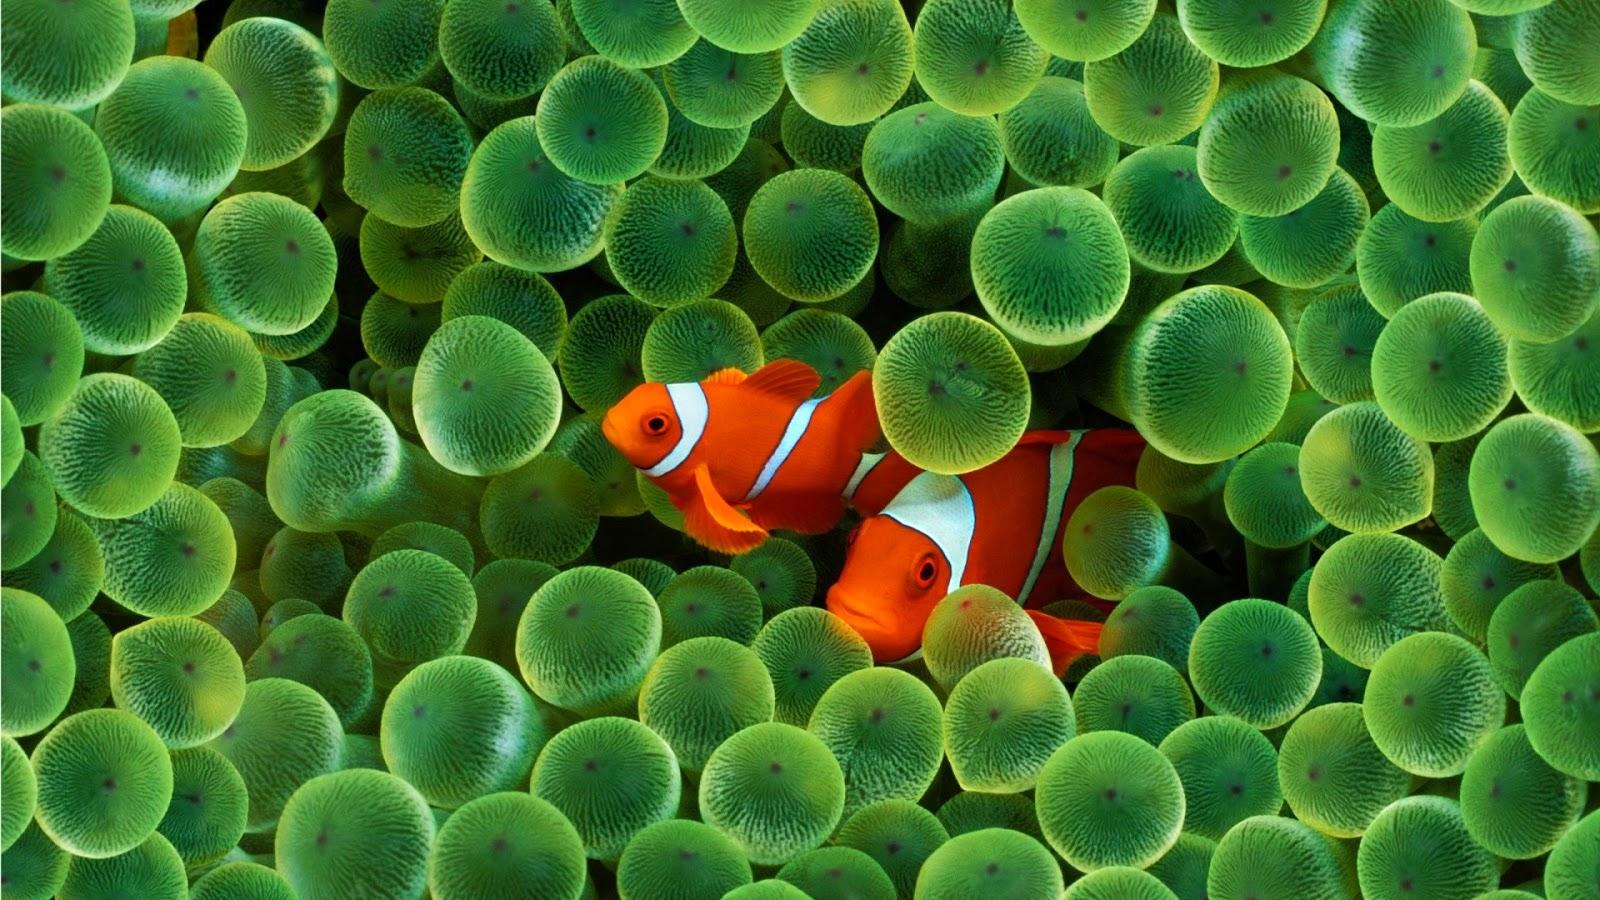 Unduh 105 Wallpaper Pemandangan Ikan Gambar HD Terbaik